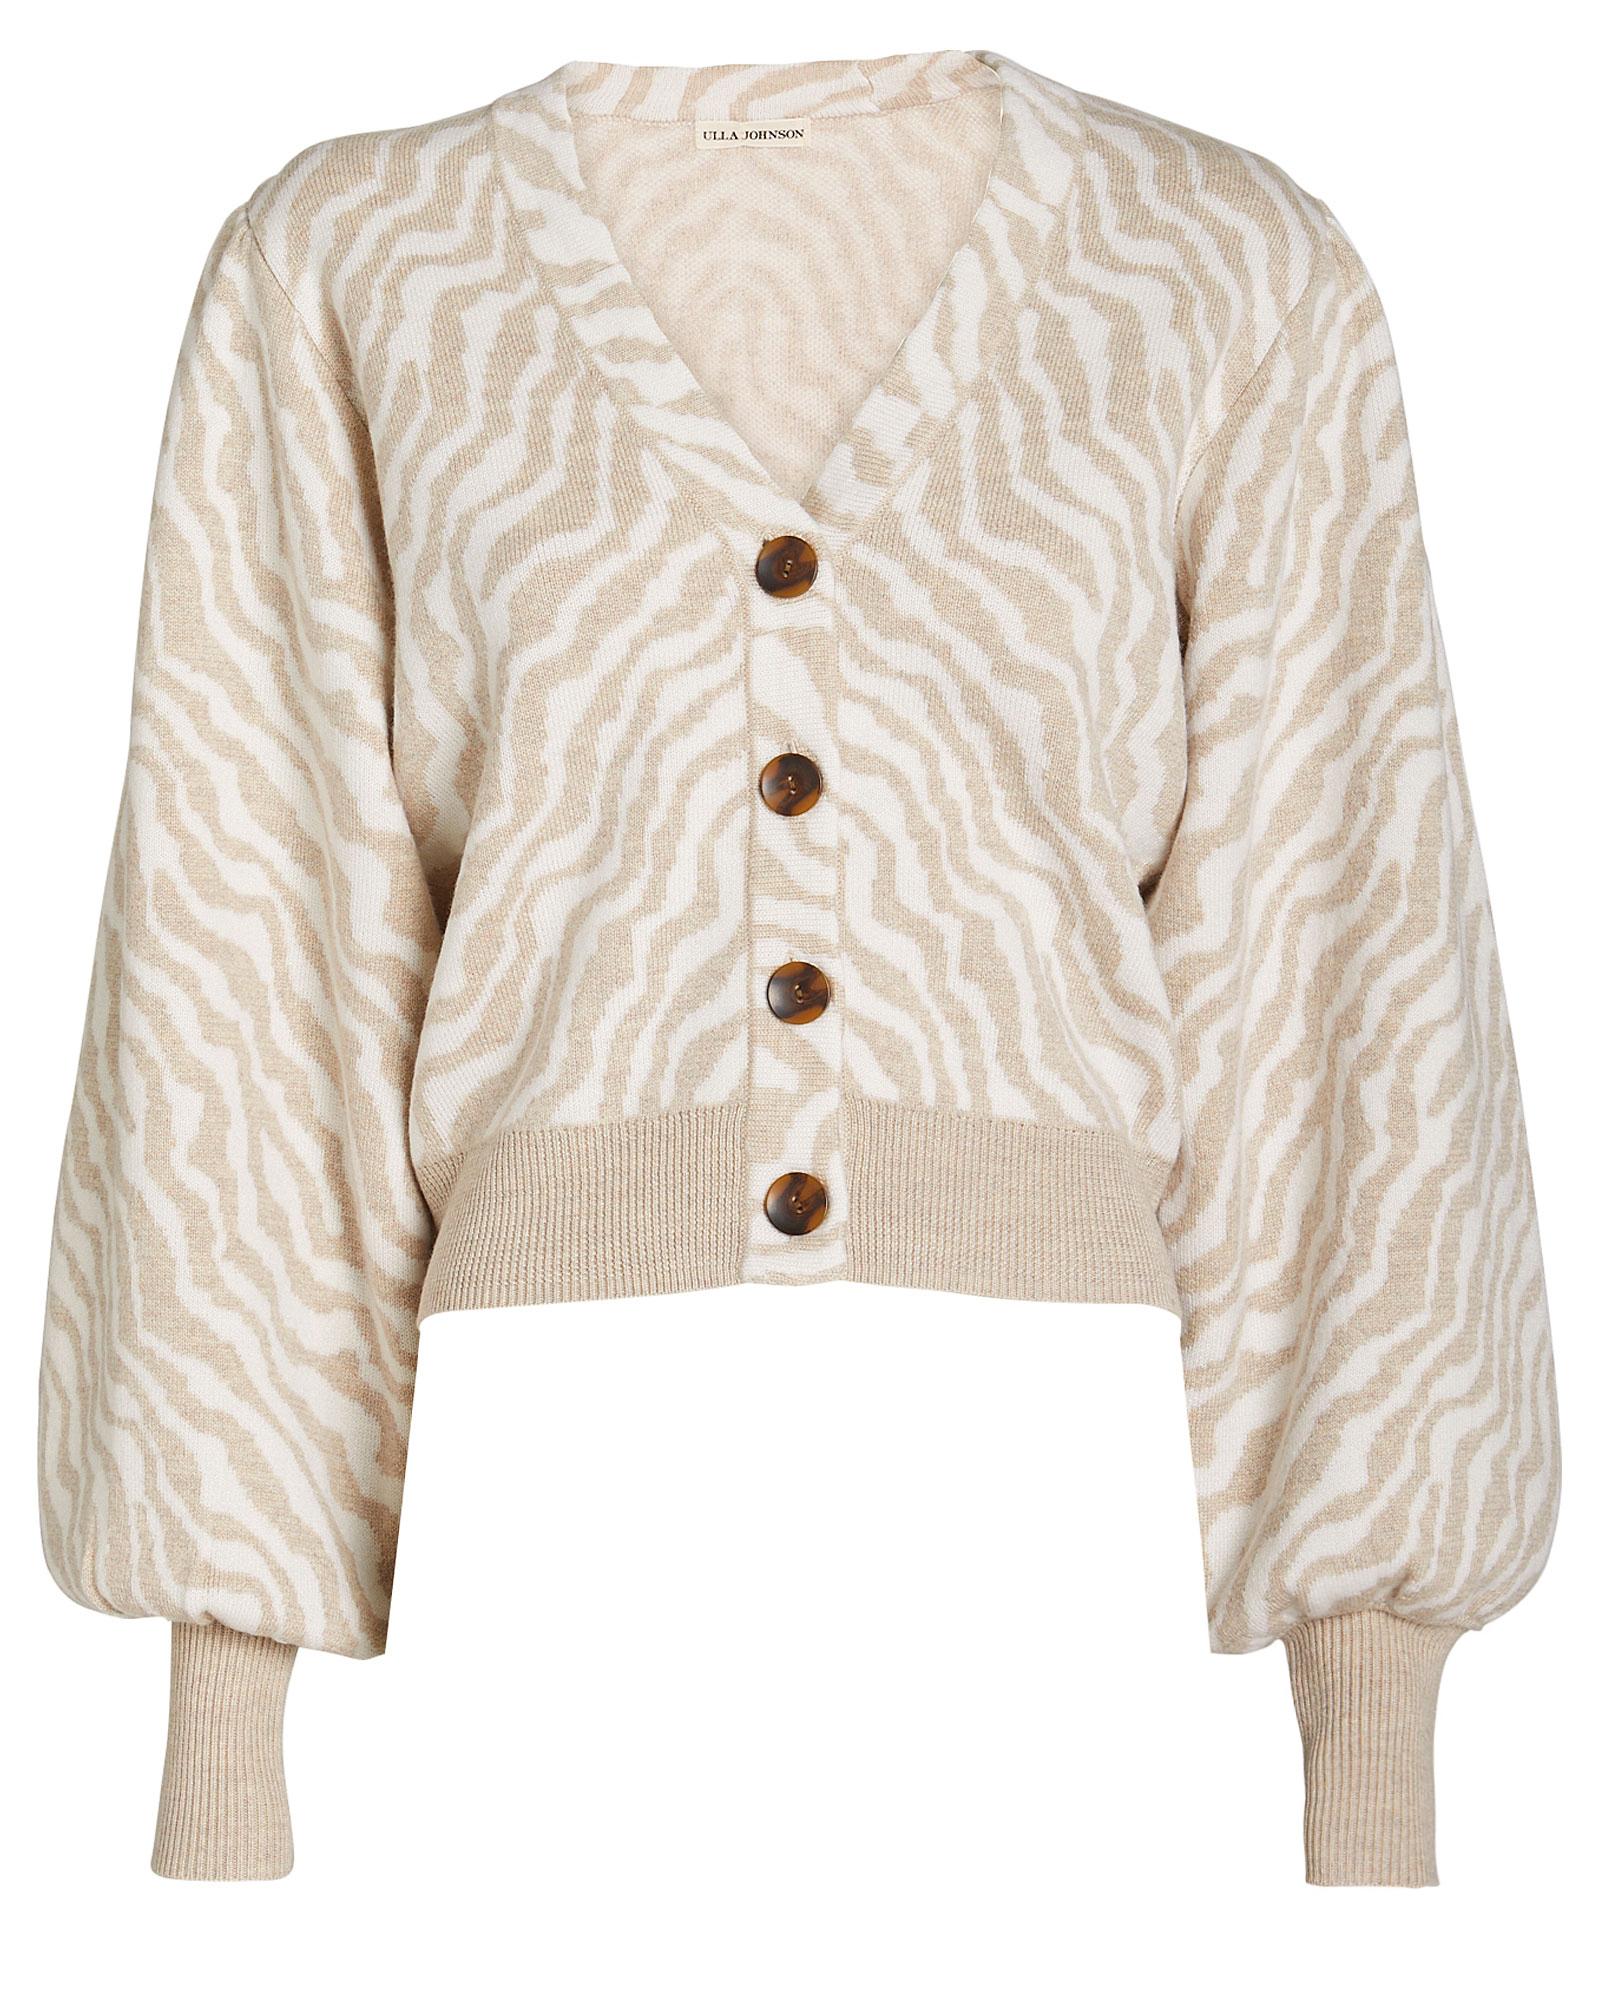 Cici Zebra Knit Wool Cardigan by Ulla Johnson